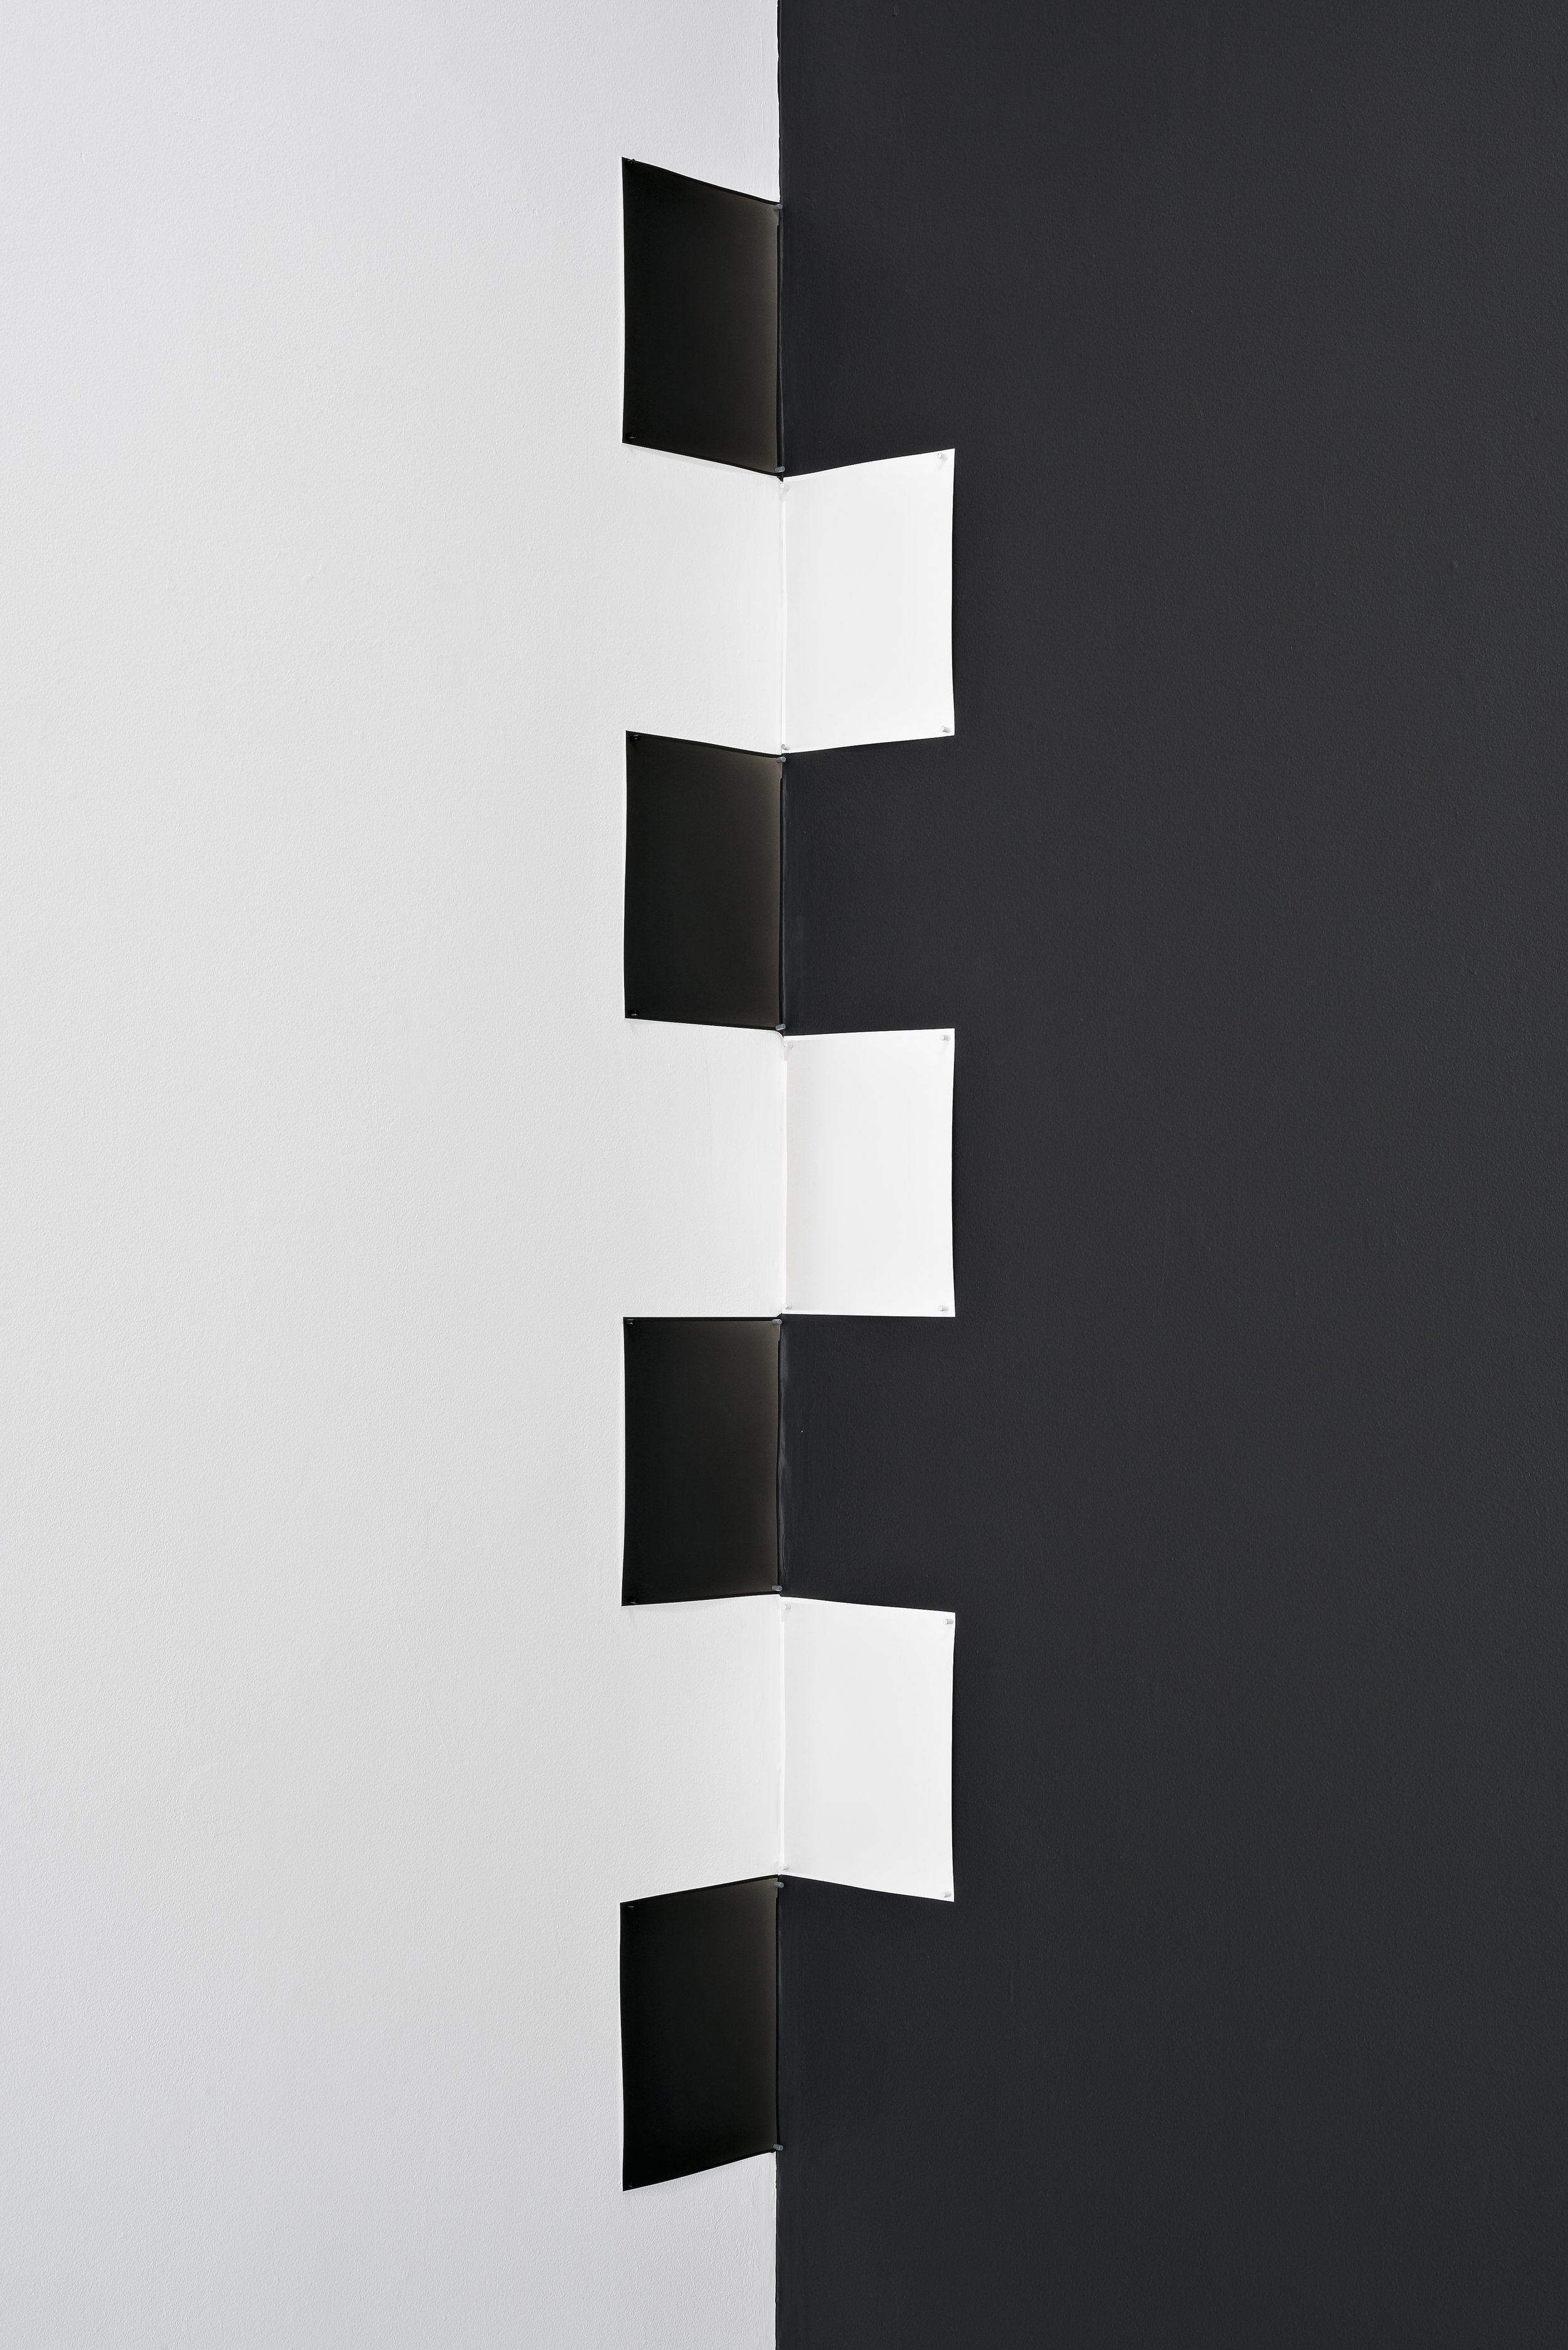 2019_04 - EUQINOM - Davis install-07.jpg